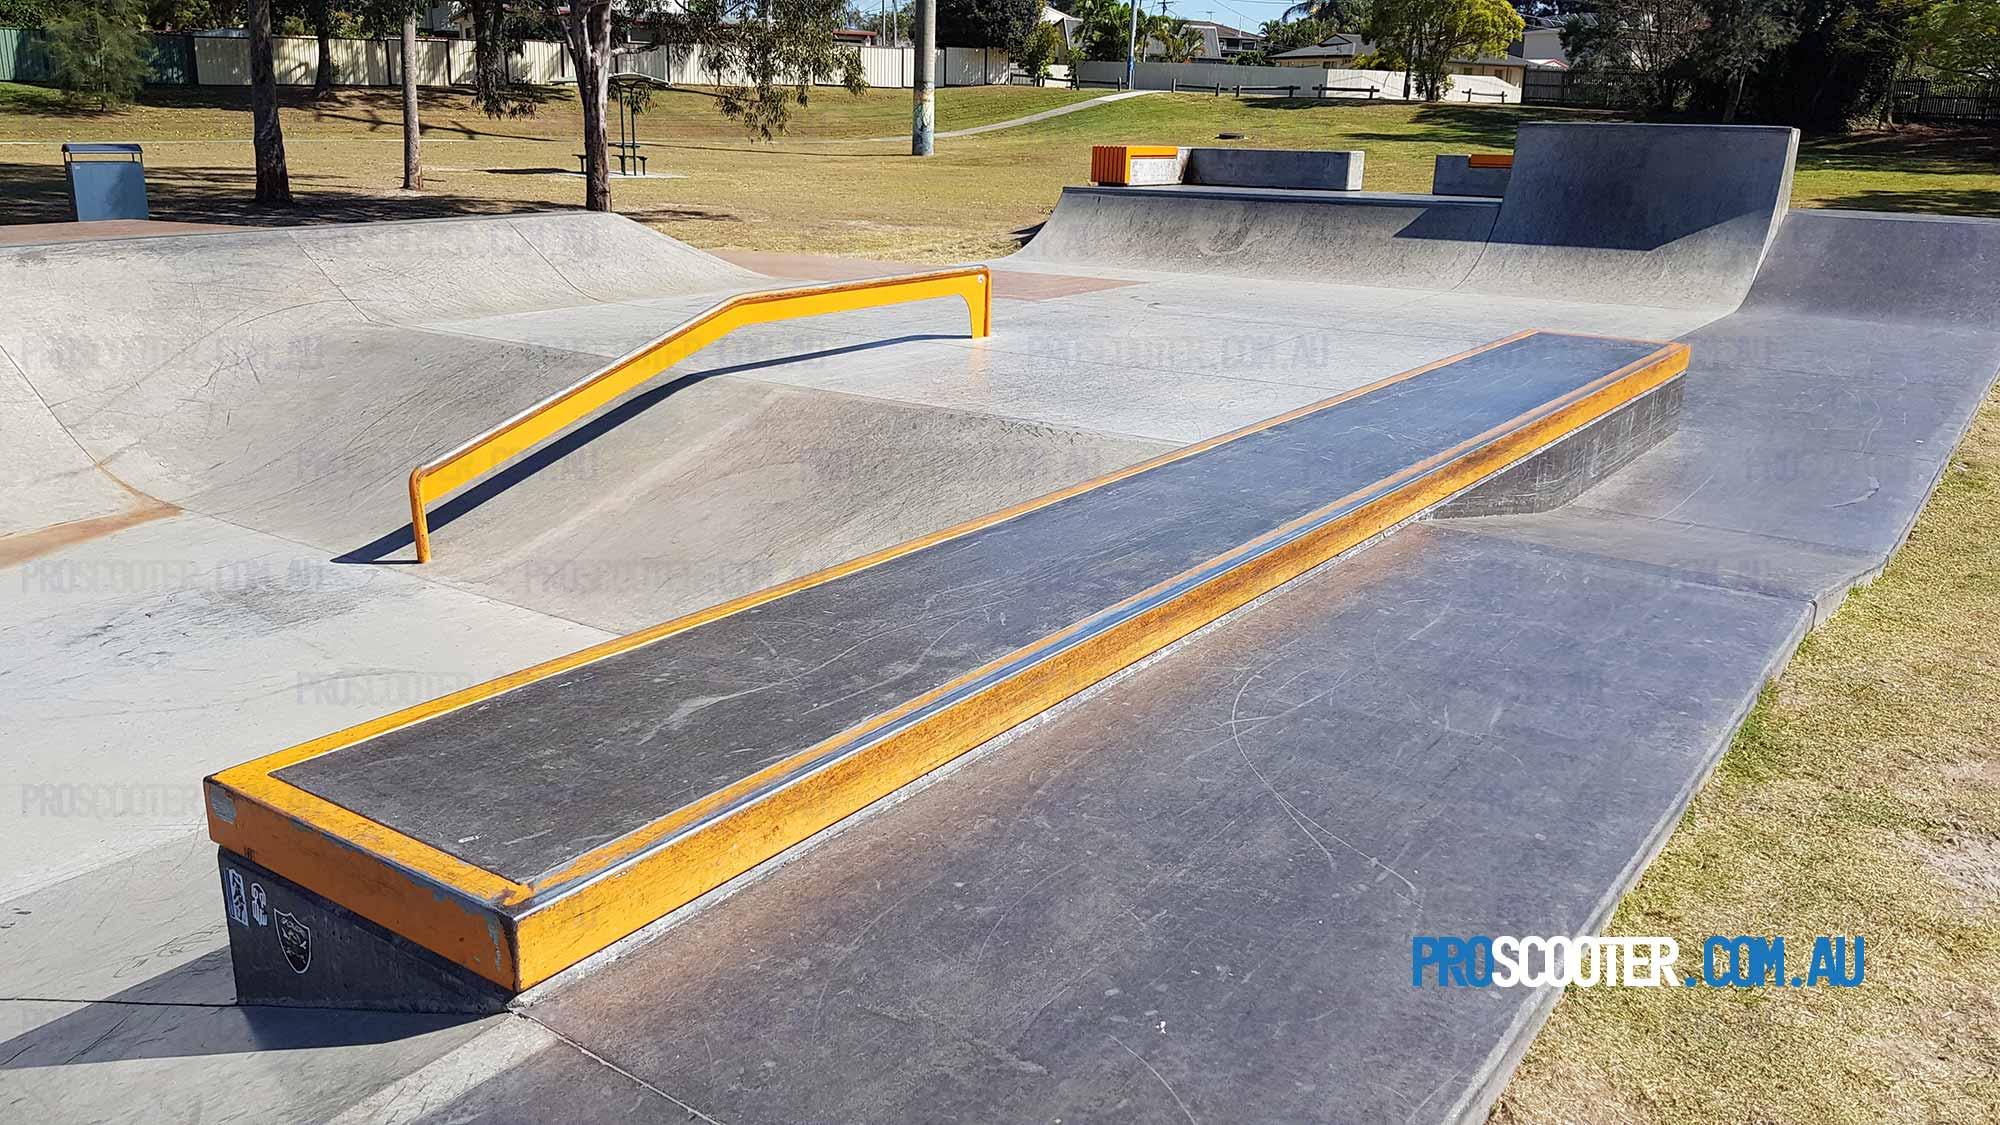 Loganholme Skatepark Speed banks and rails